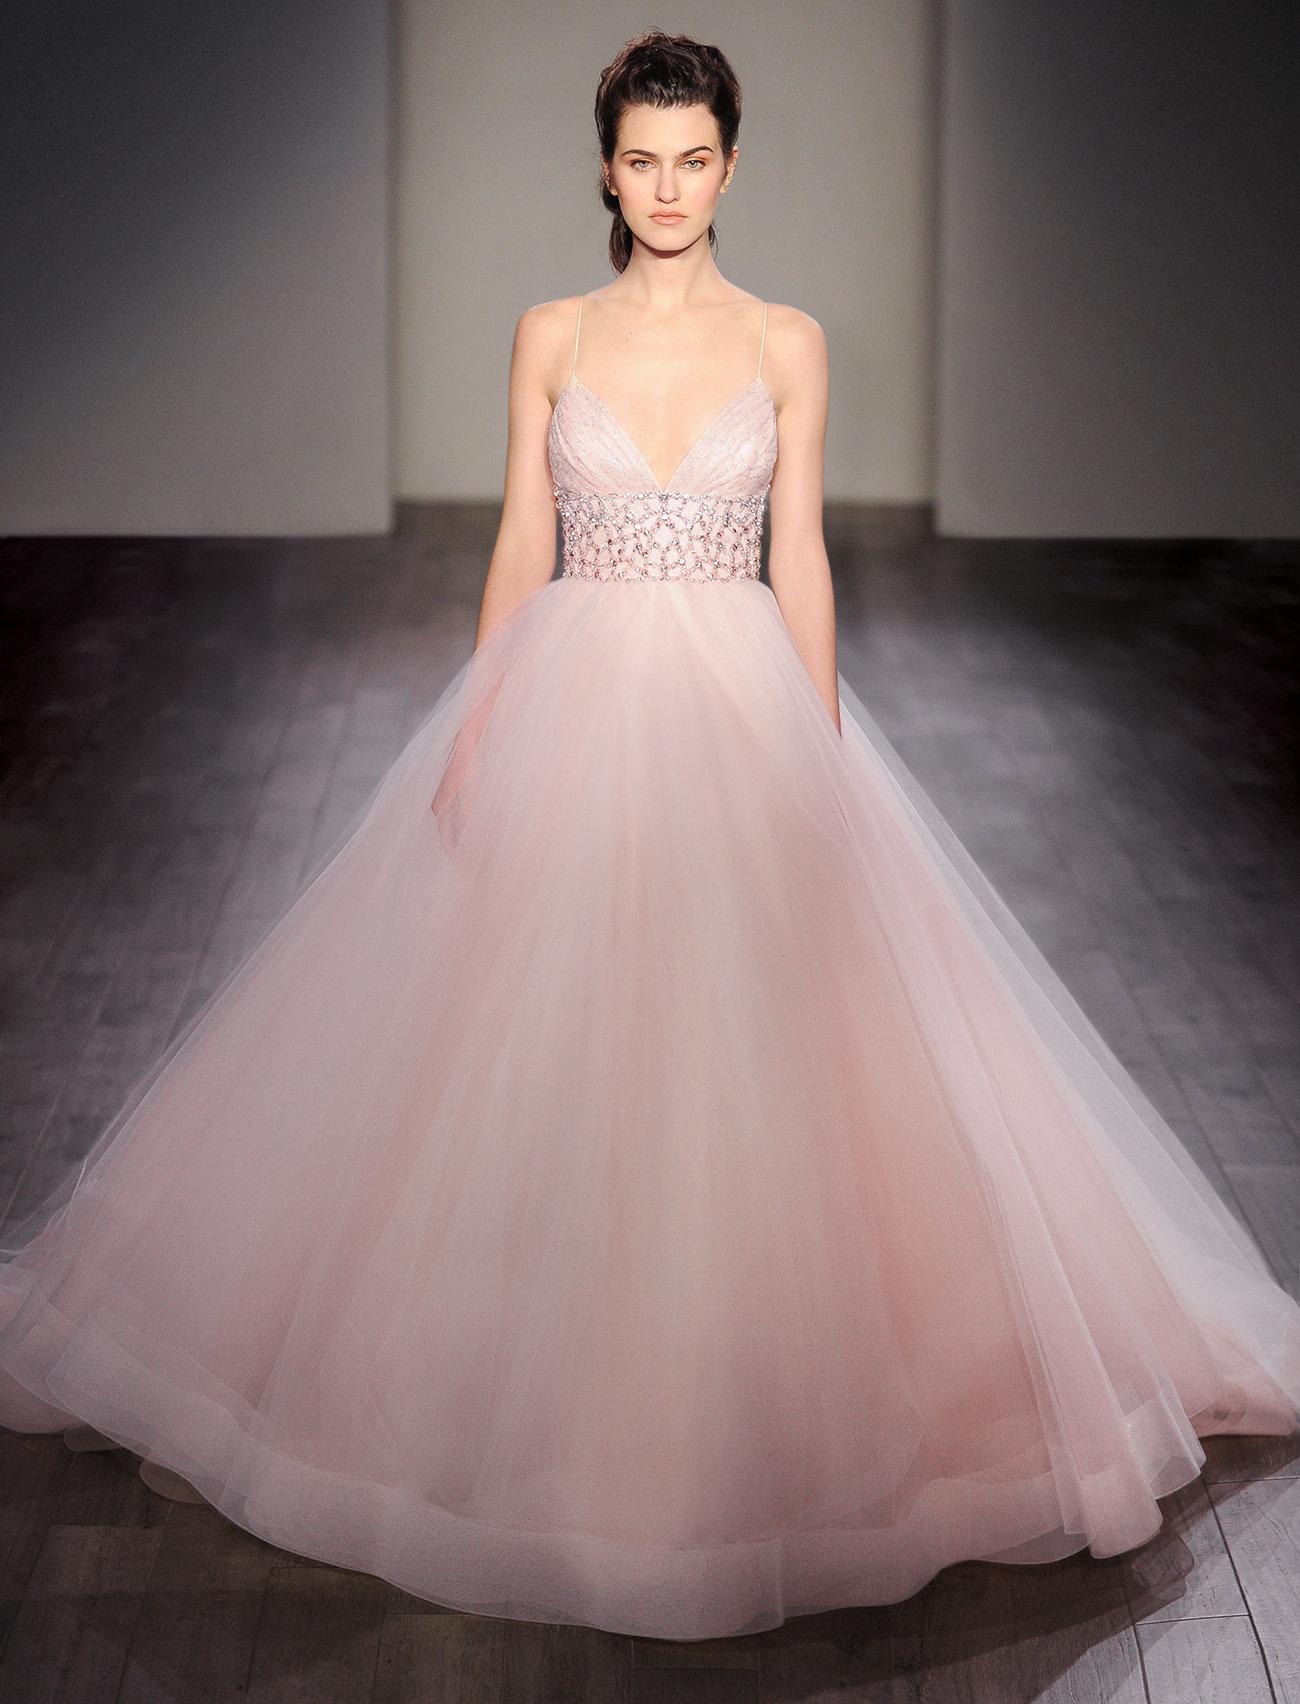 Unique Lazaro Evening Gowns Festooning - Ball Gown Wedding Dresses ...